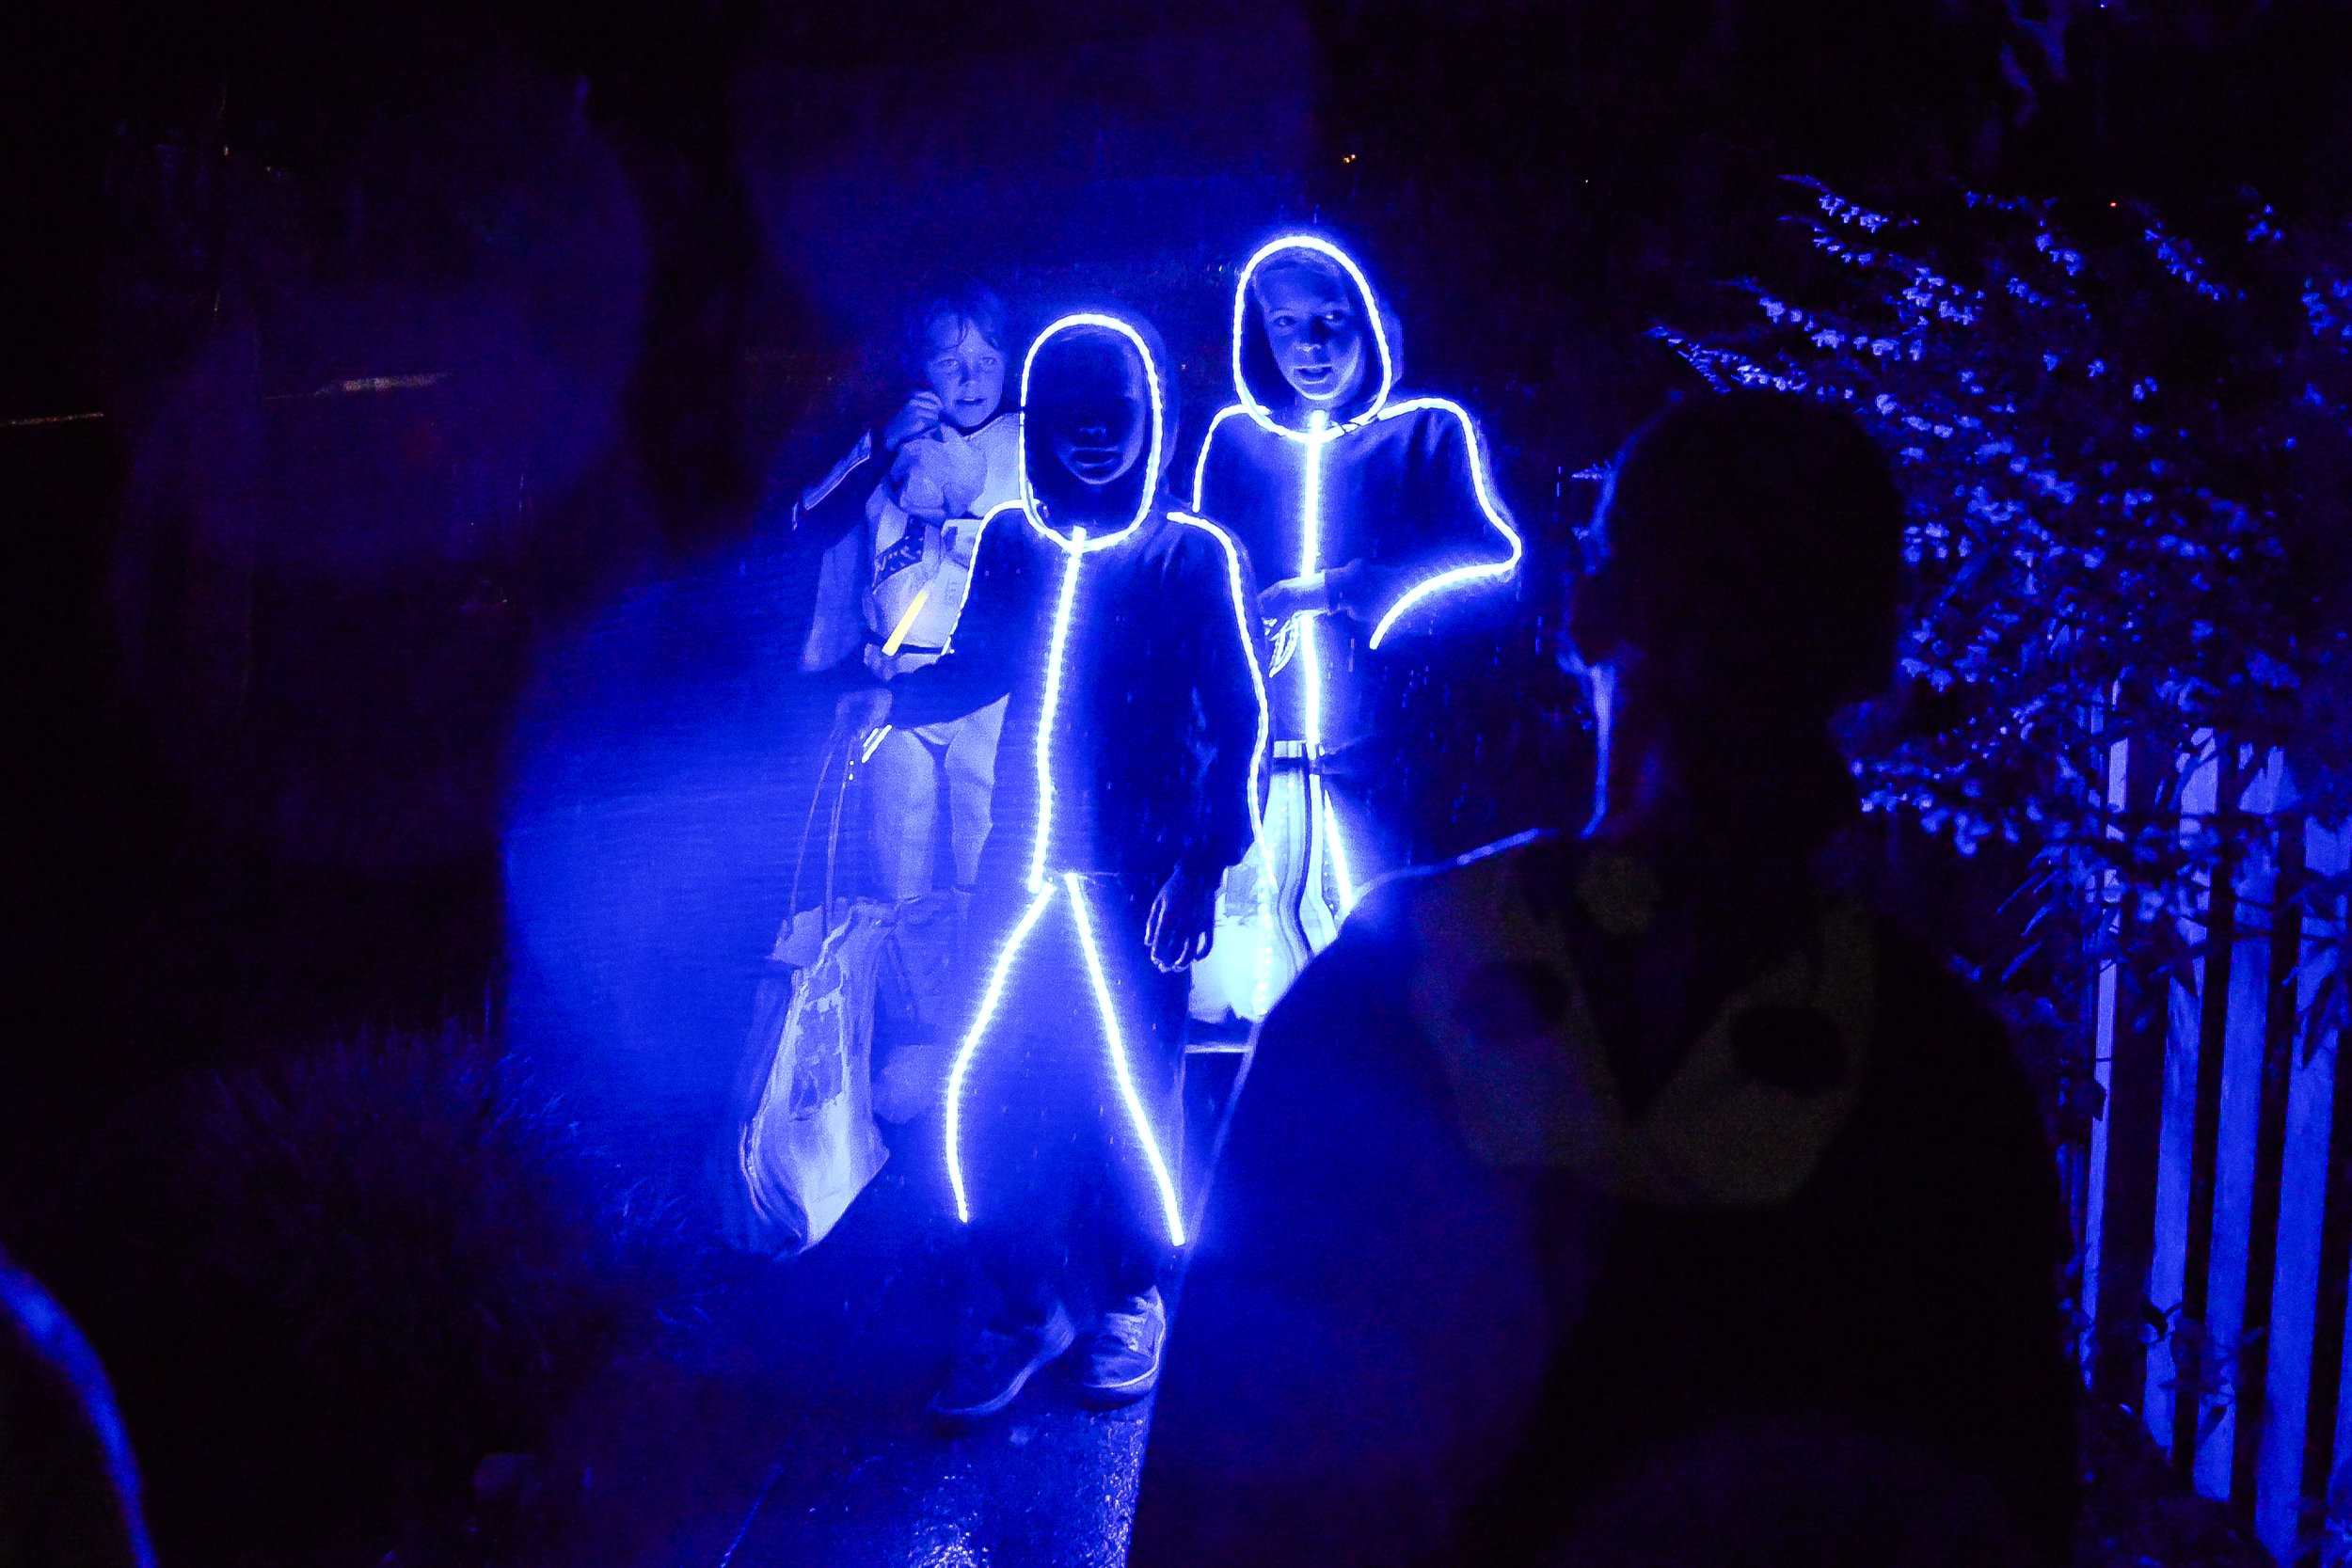 Halloween-blue-glow-1.jpg